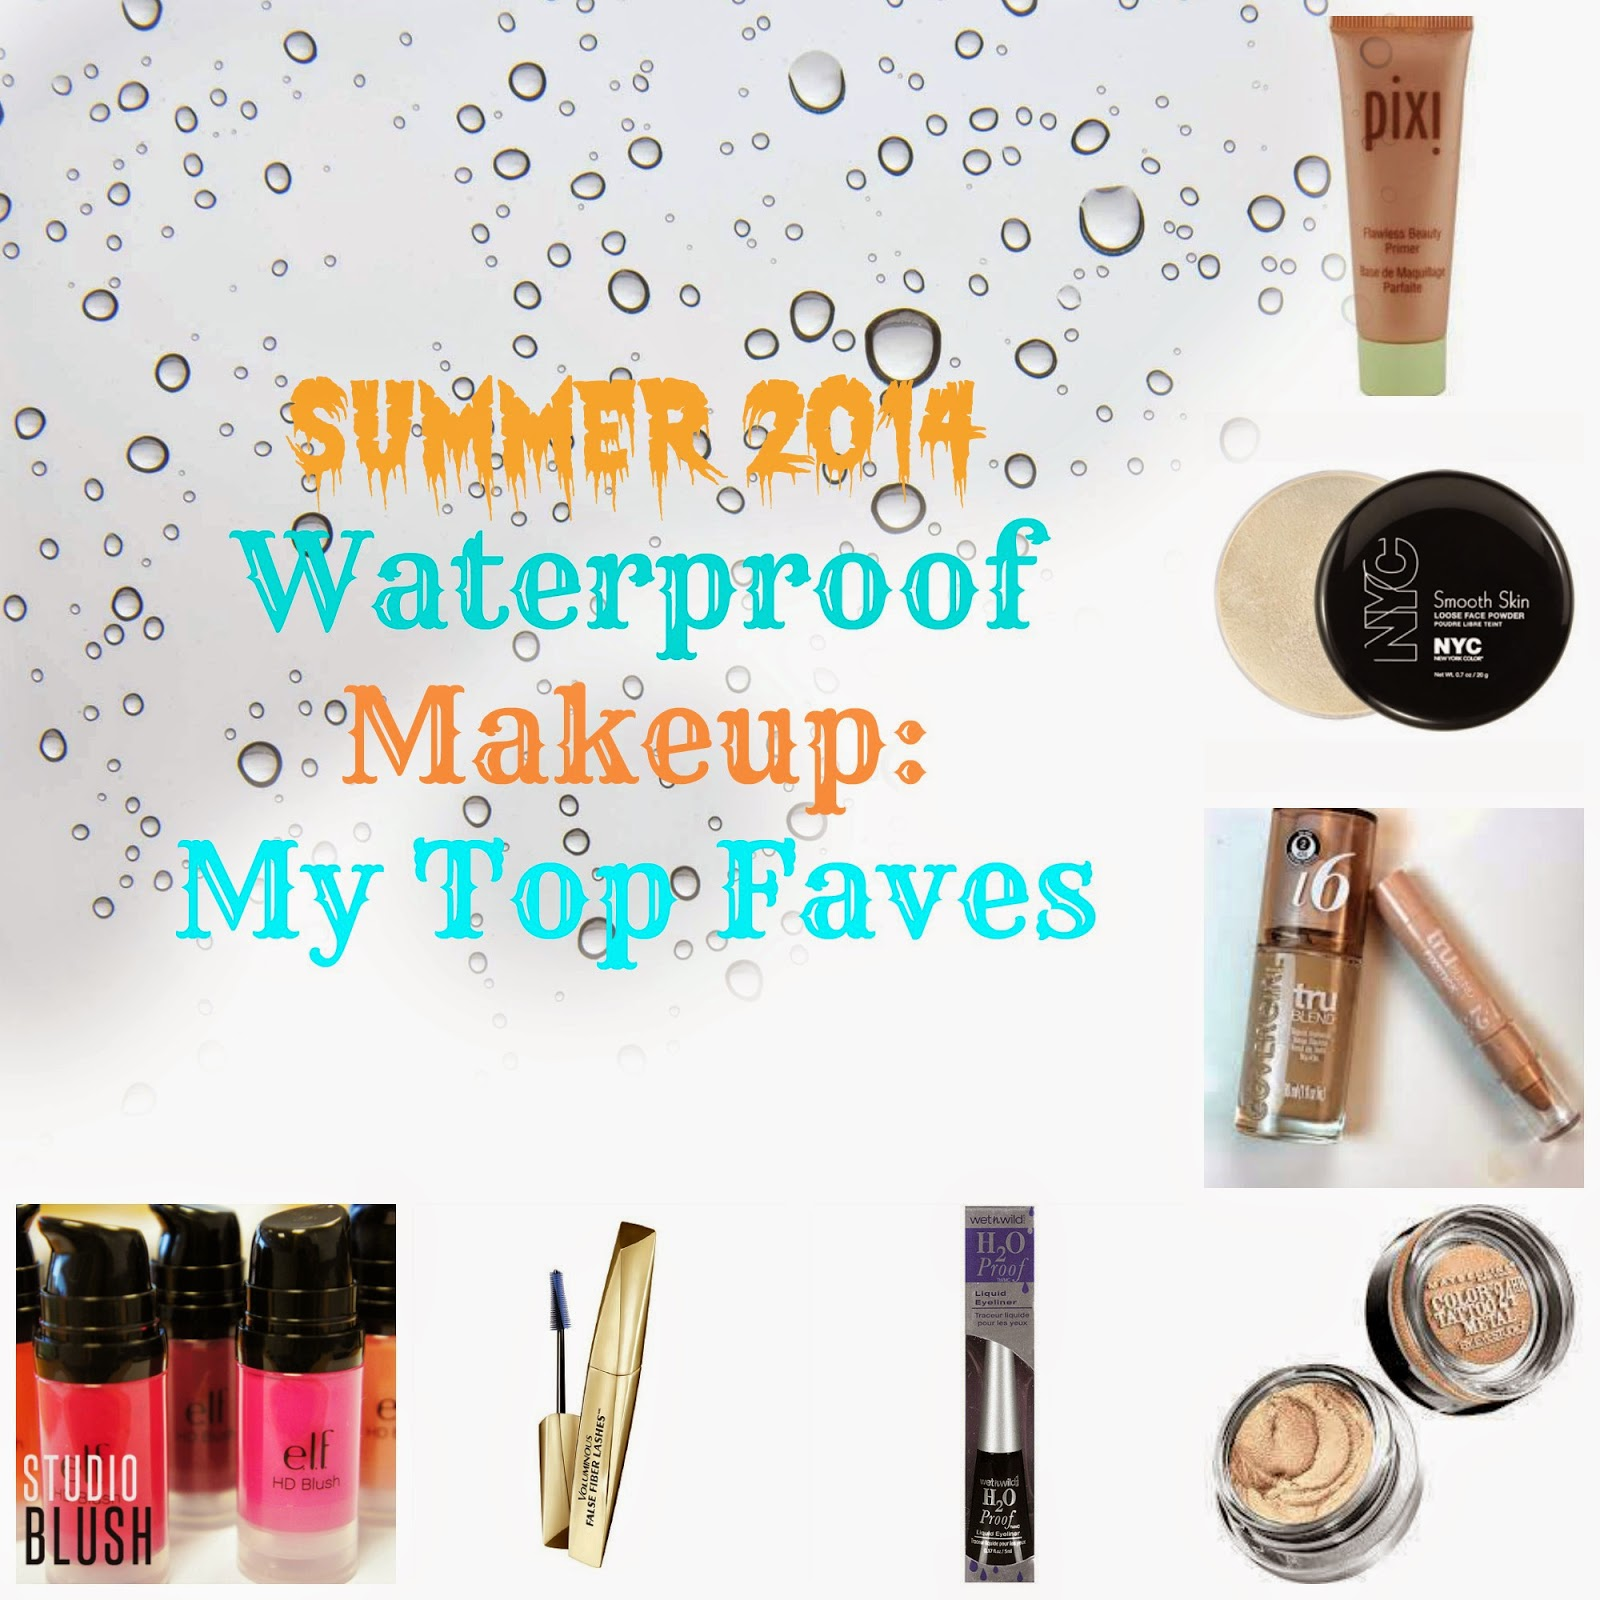 Sweat proof makeup drugstore